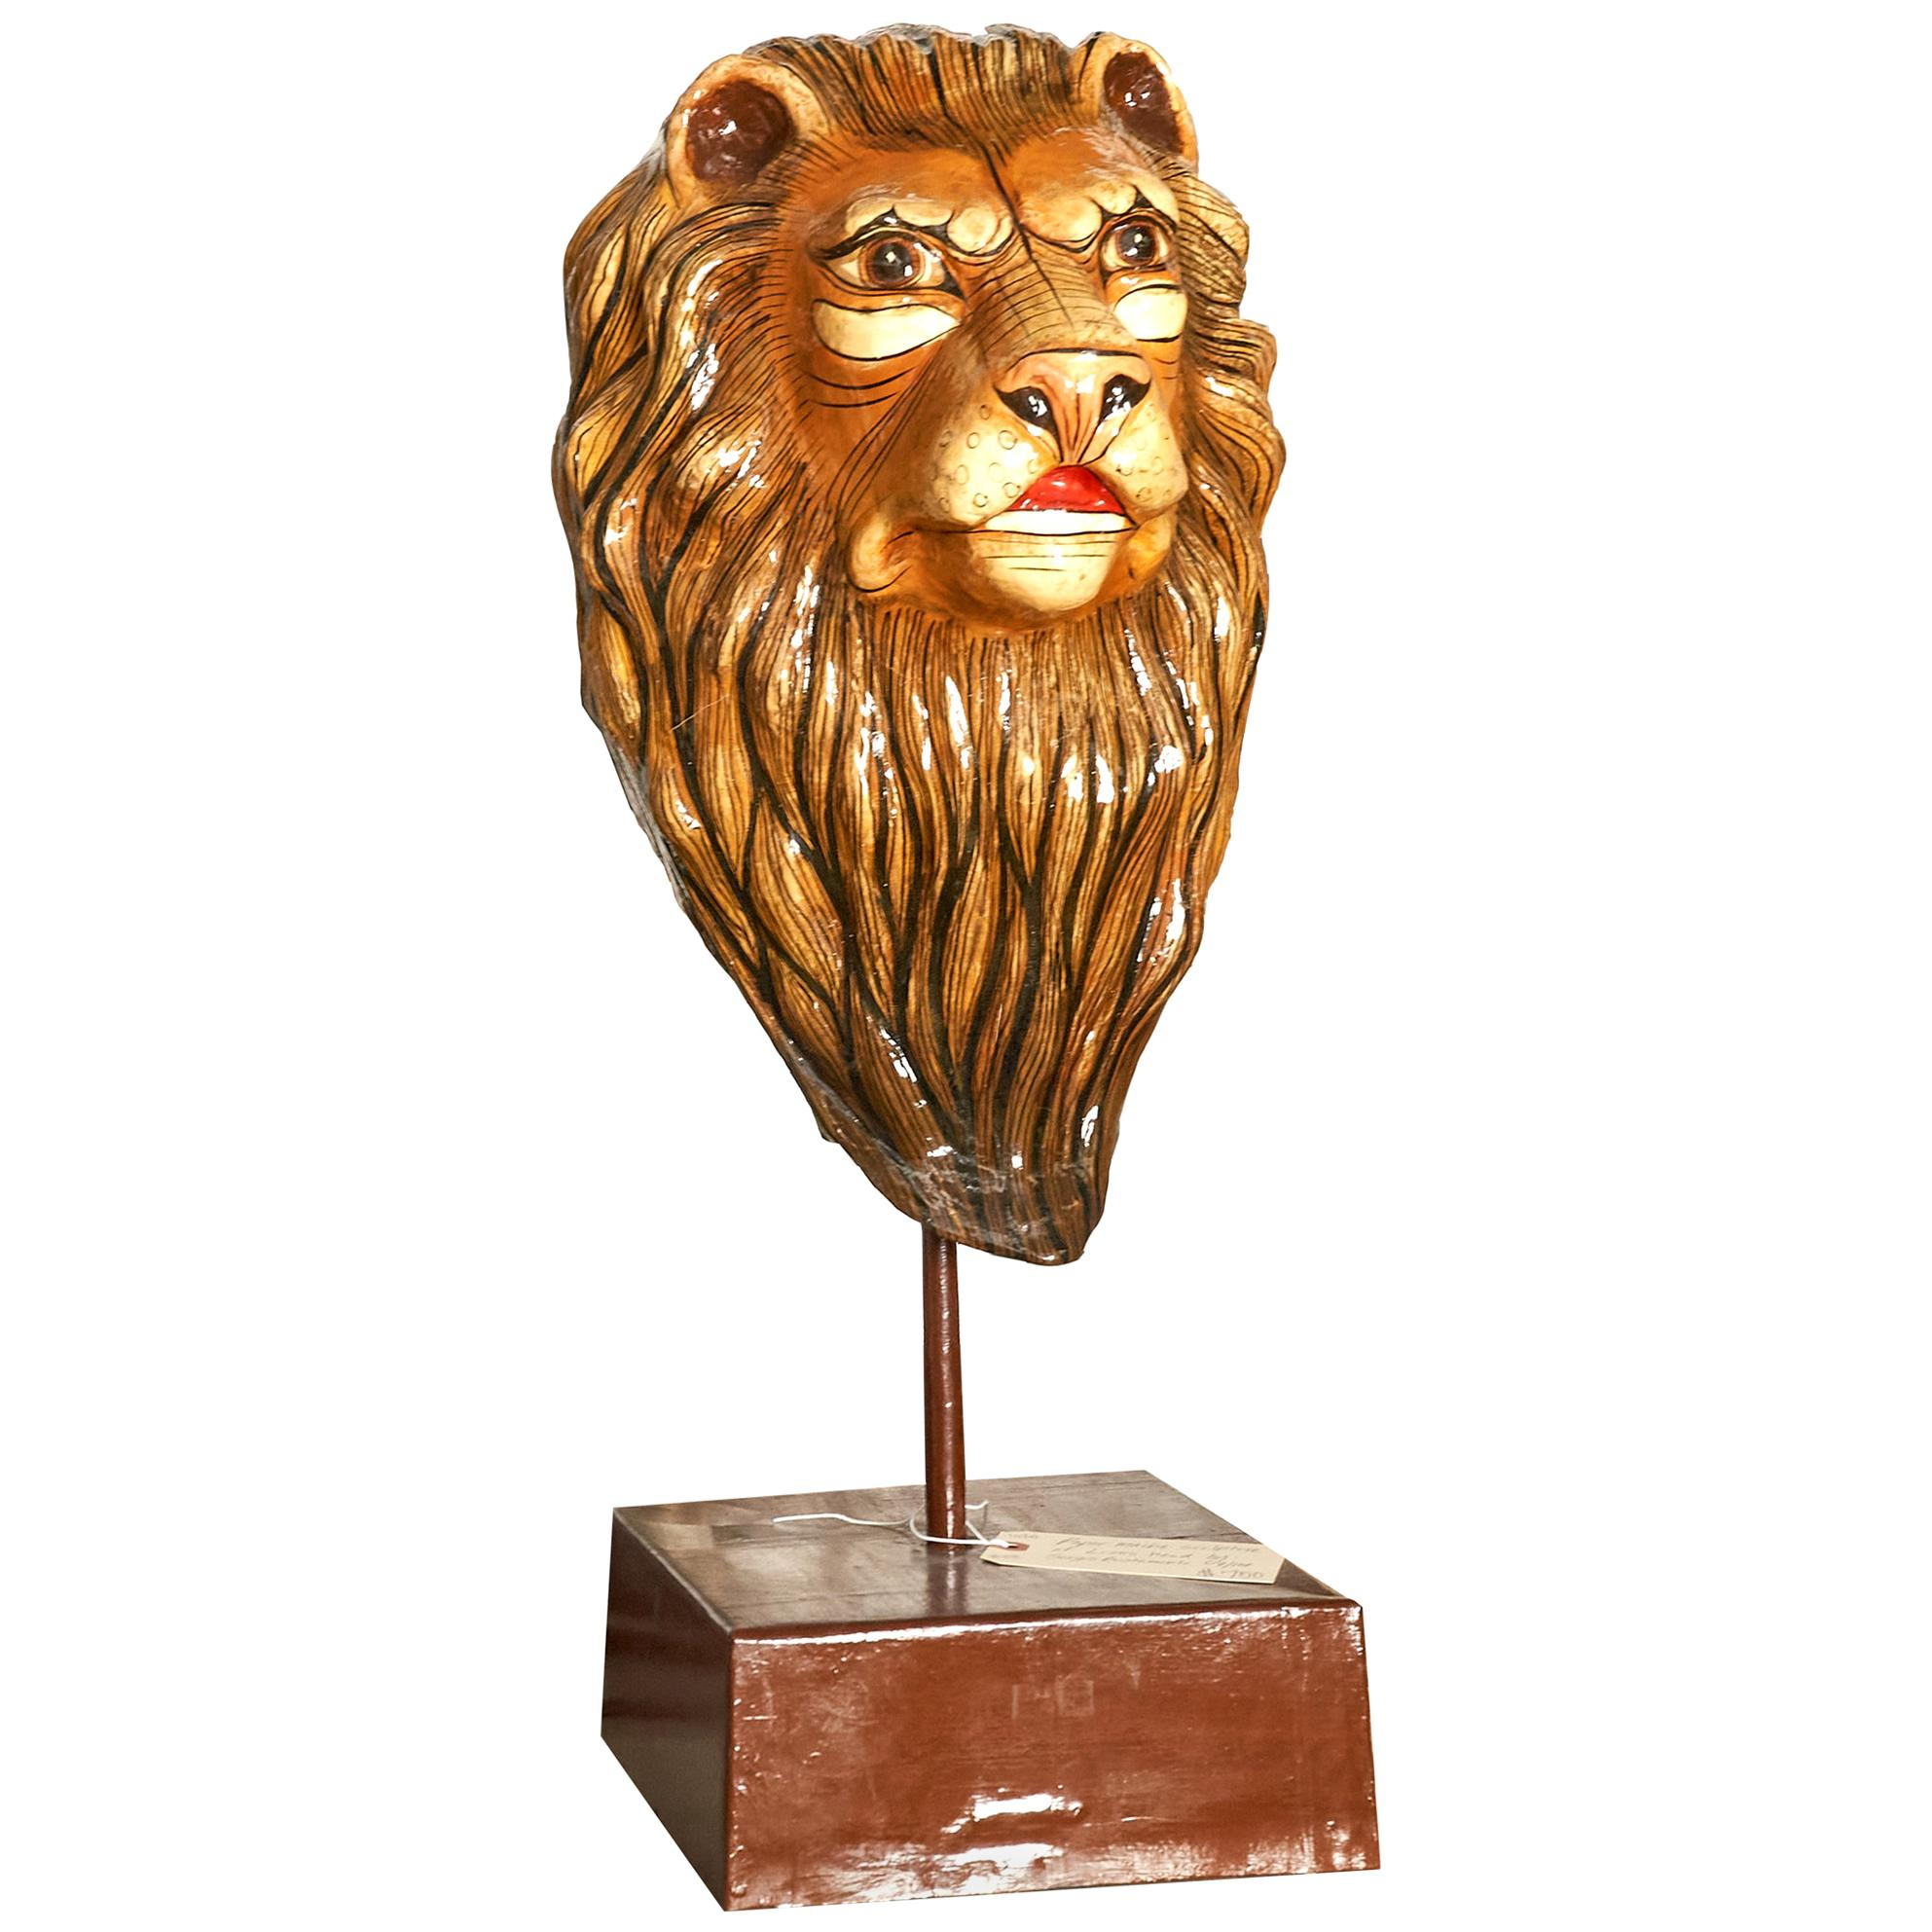 Papier Mâché Lion Head Signed by Sergio Bustamante, Mexico, 9/100